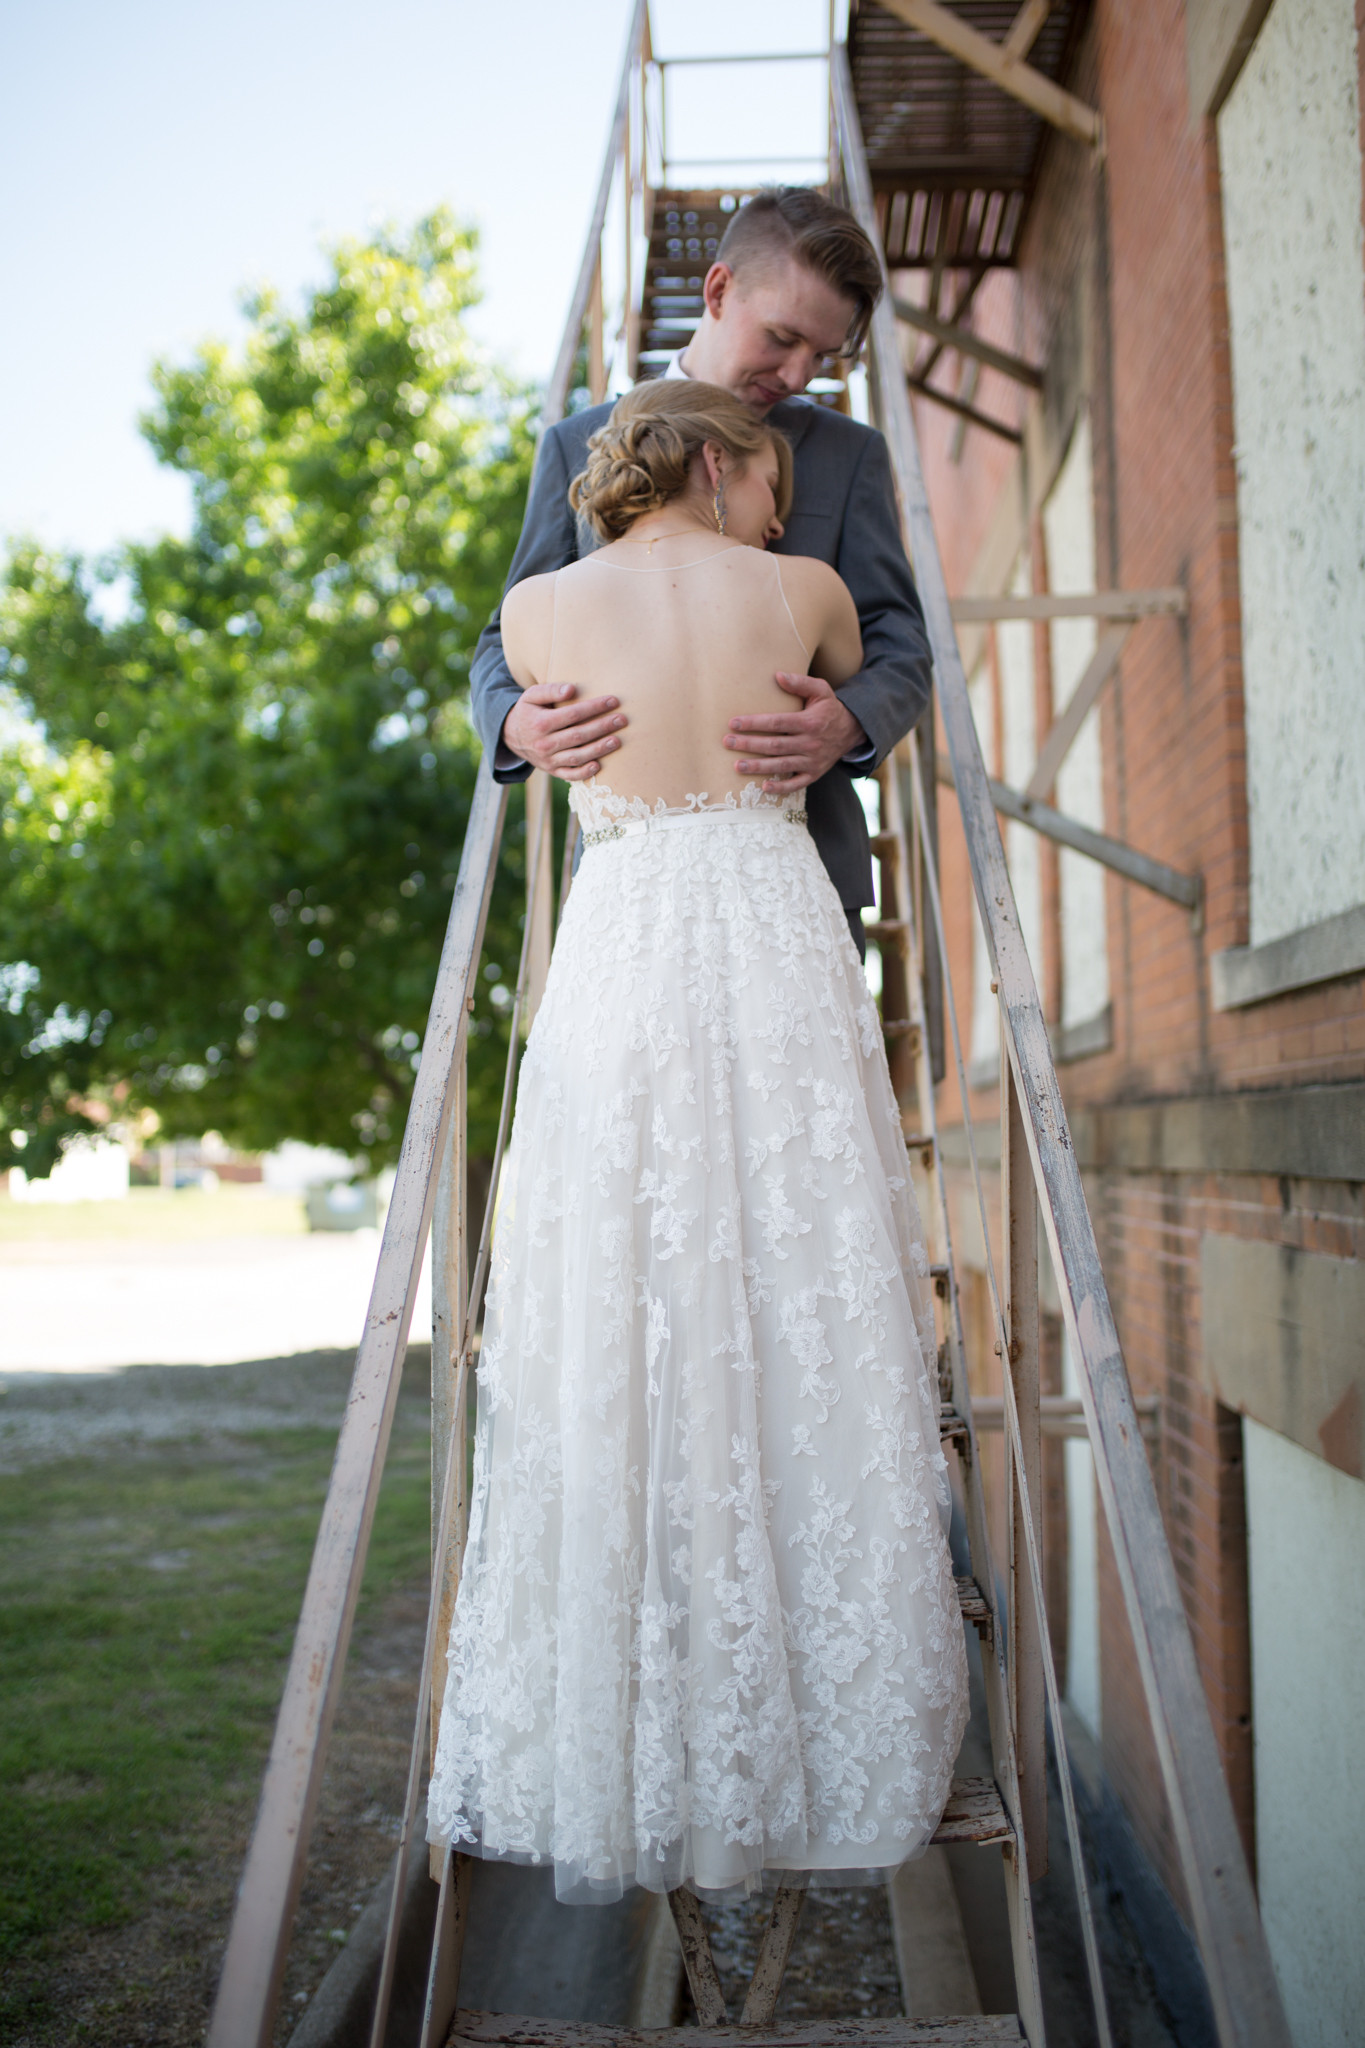 Jessica-Nat-Wedding-PhotoKumar (24 of 33).jpg